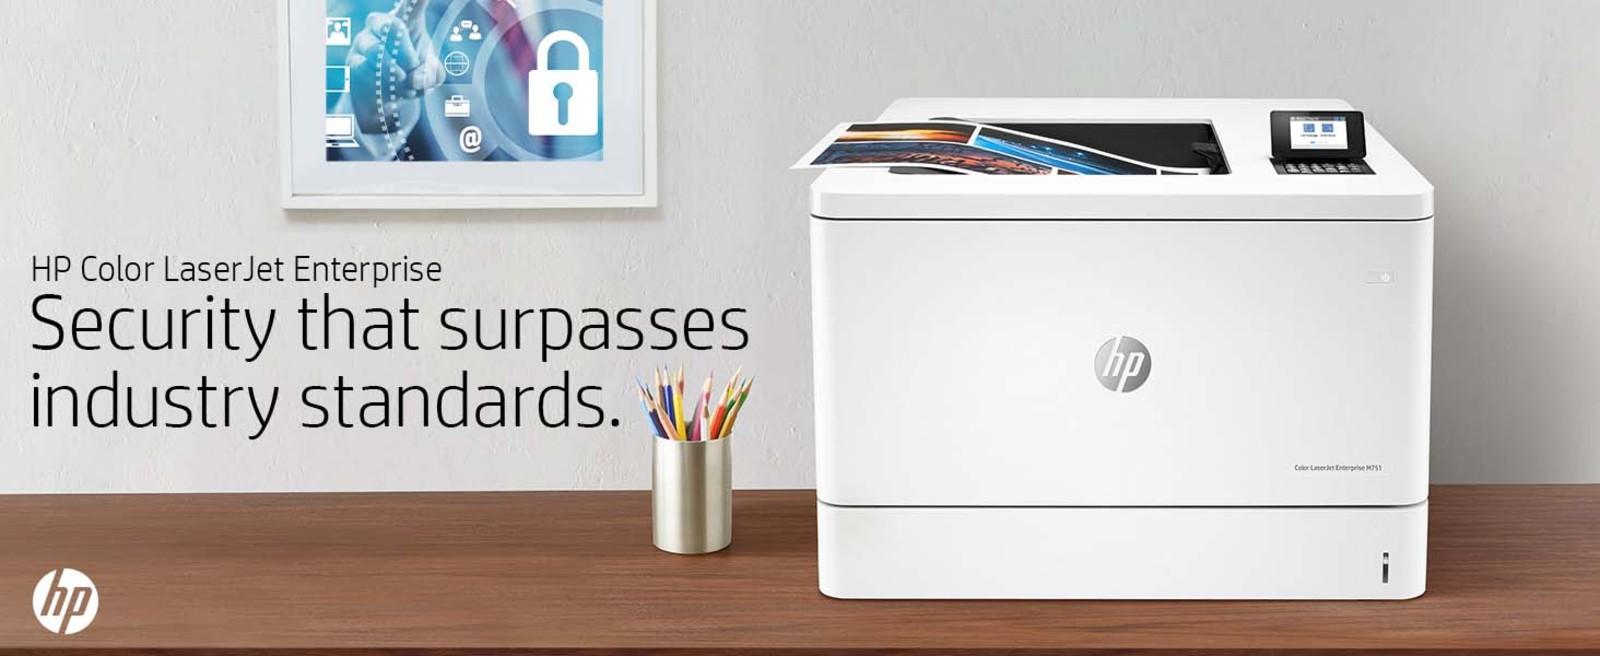 HP Enterprise Laser Printer Security